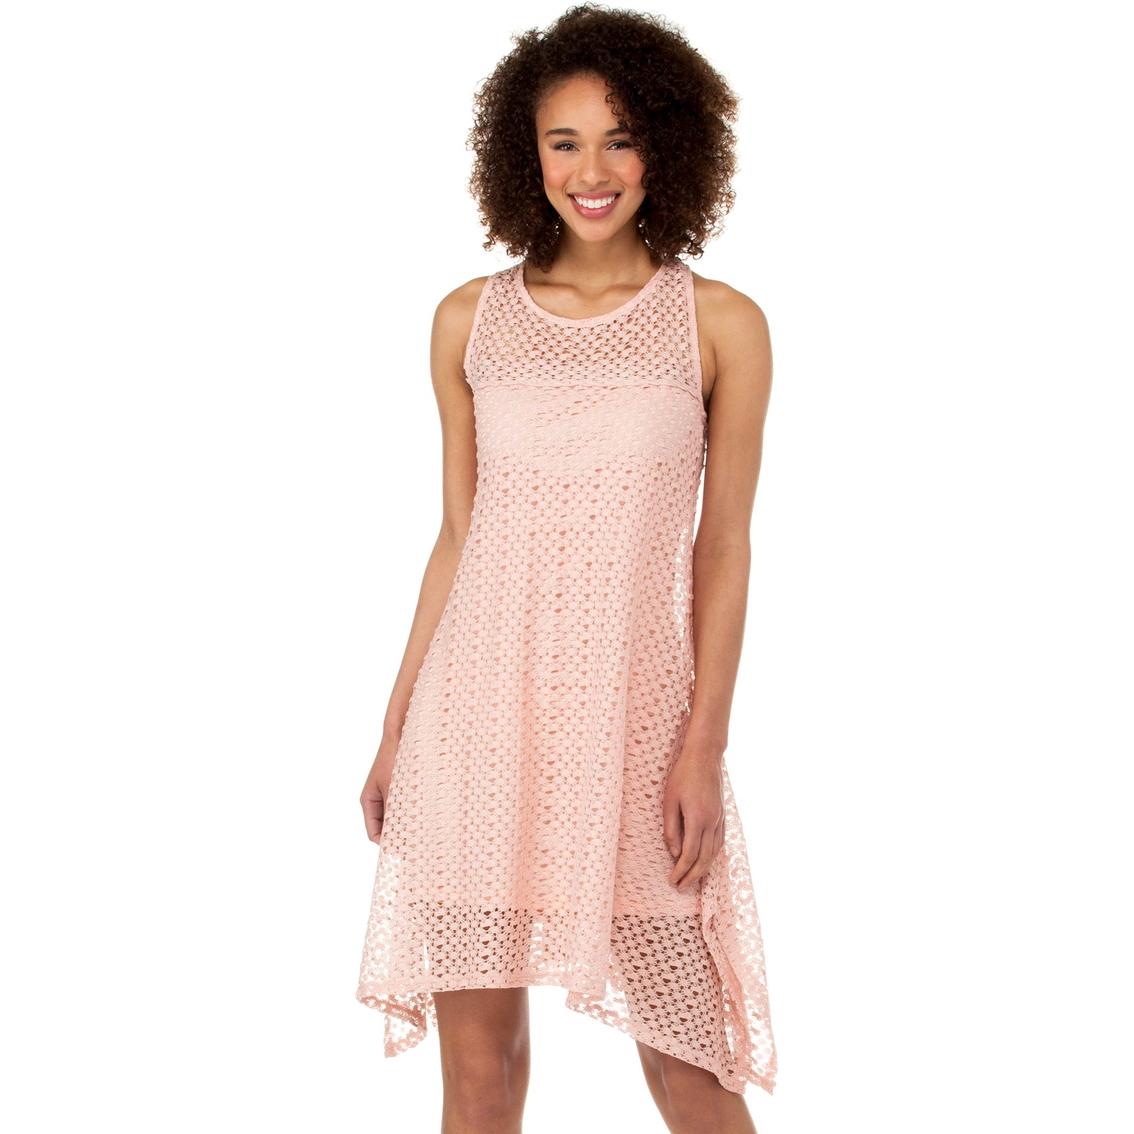 312f1846bd51e Robbie Bee Crochet Swing Dress | Dresses | Apparel | Shop The Exchange